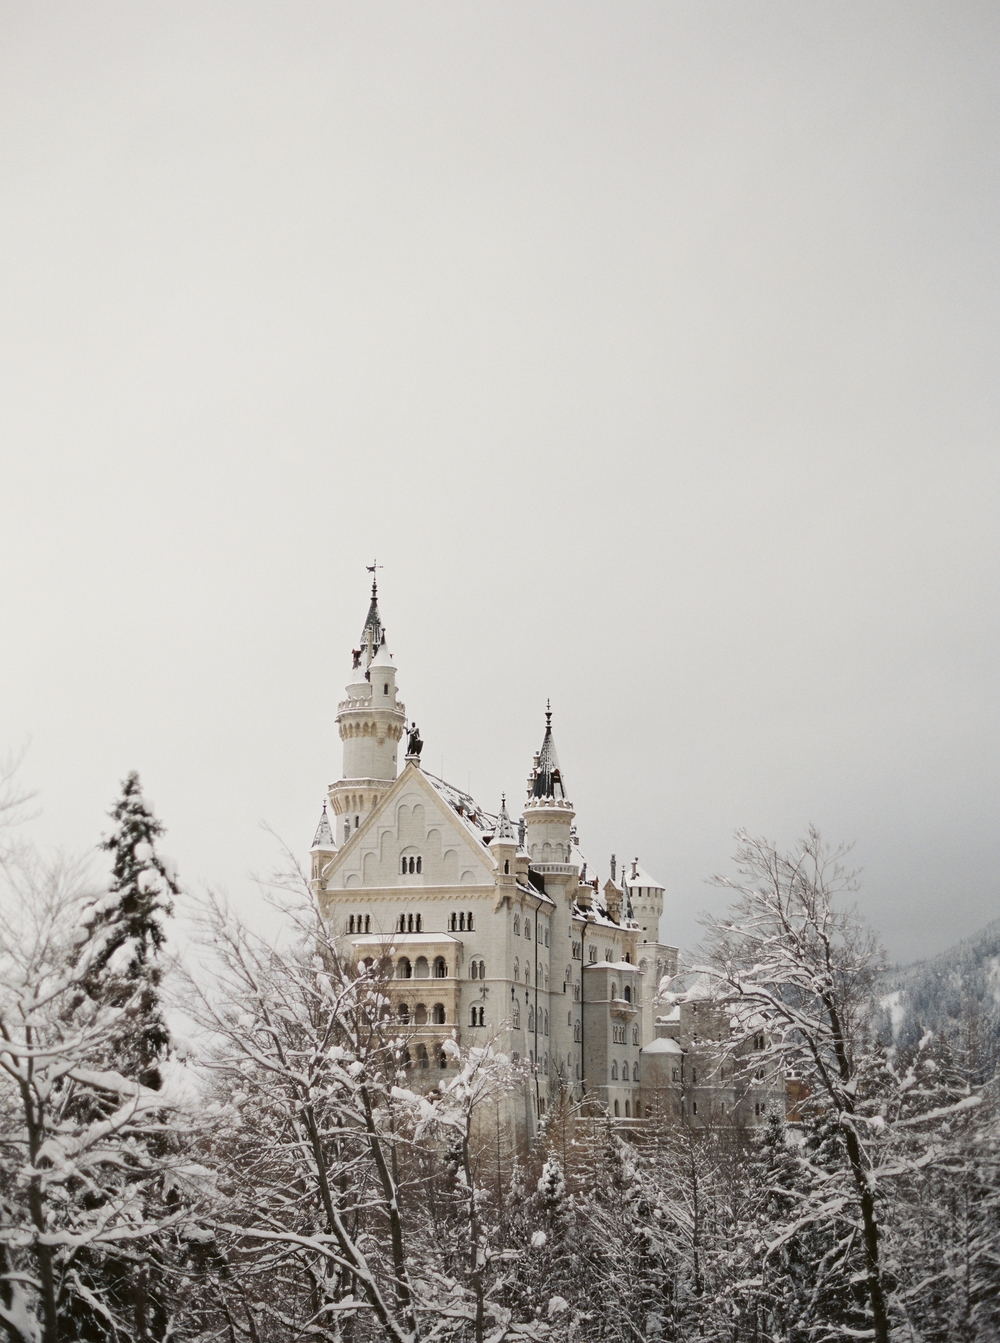 rebecca_hollis_contax645_fuji400_neuschwanstein_castle_bavaria_germany_photovision.jpg